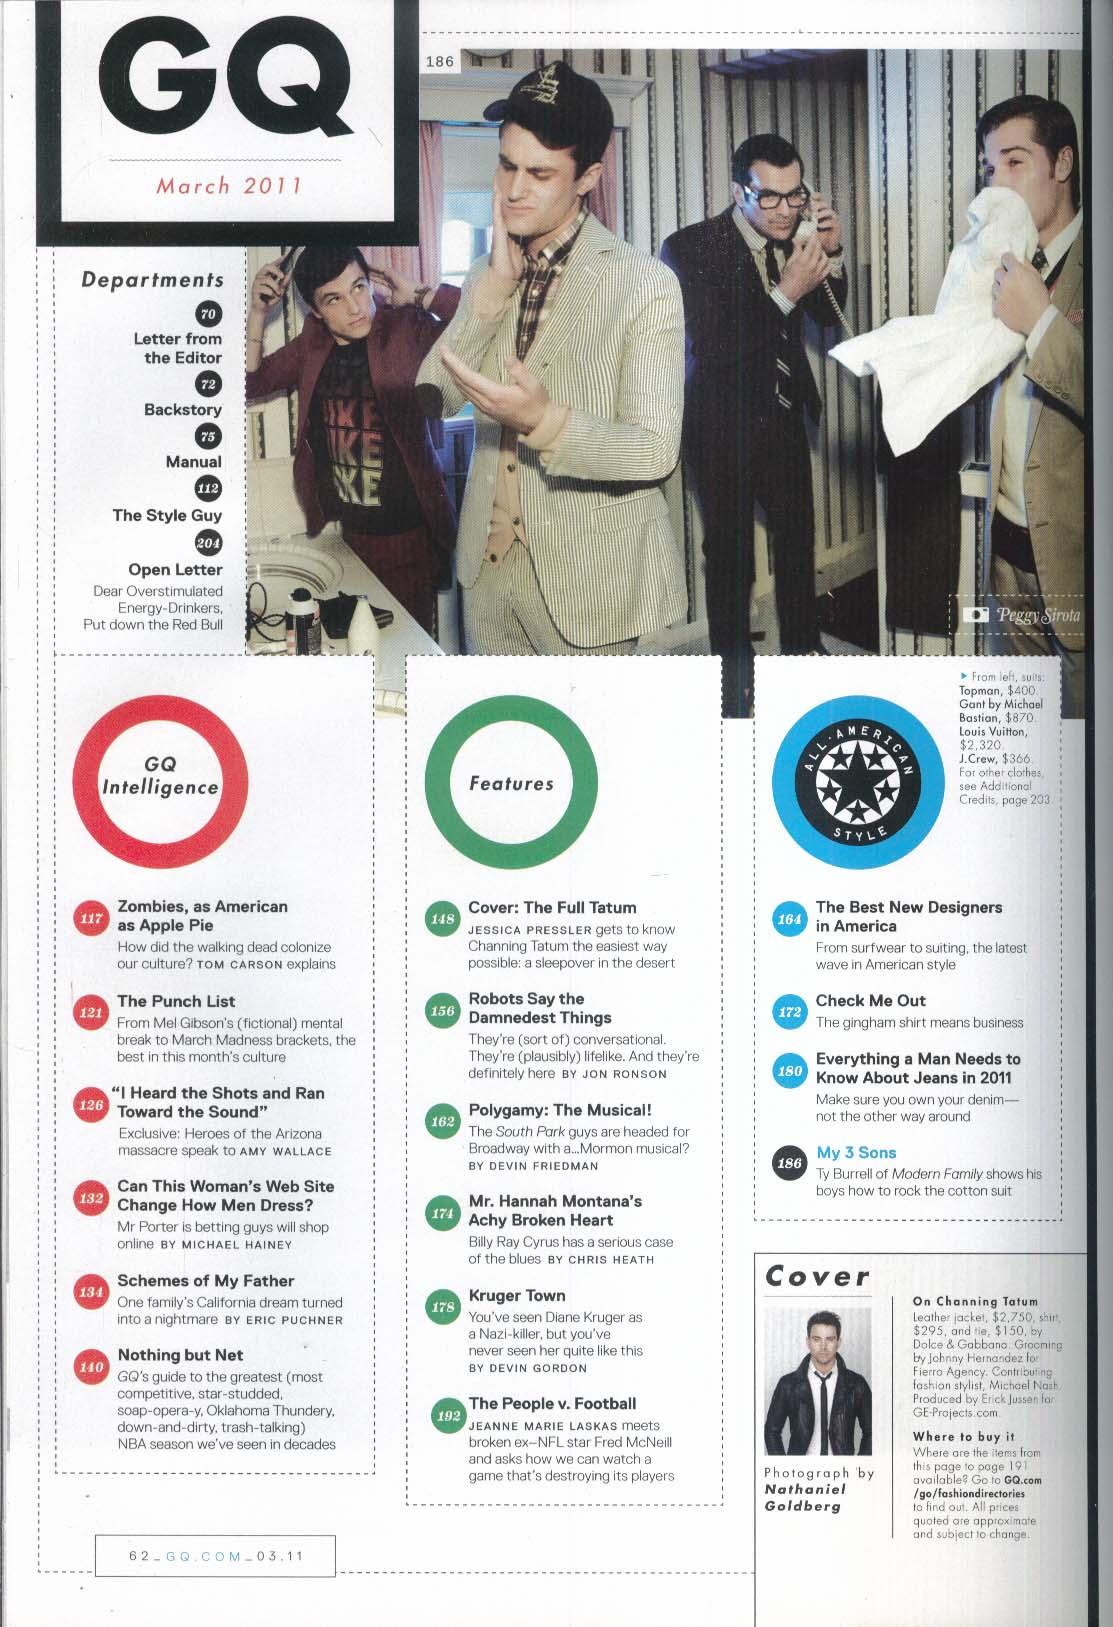 GQ Channing Tatum Billy Ray Cyrus Book of Mormon Gabby Giffords 3 2011